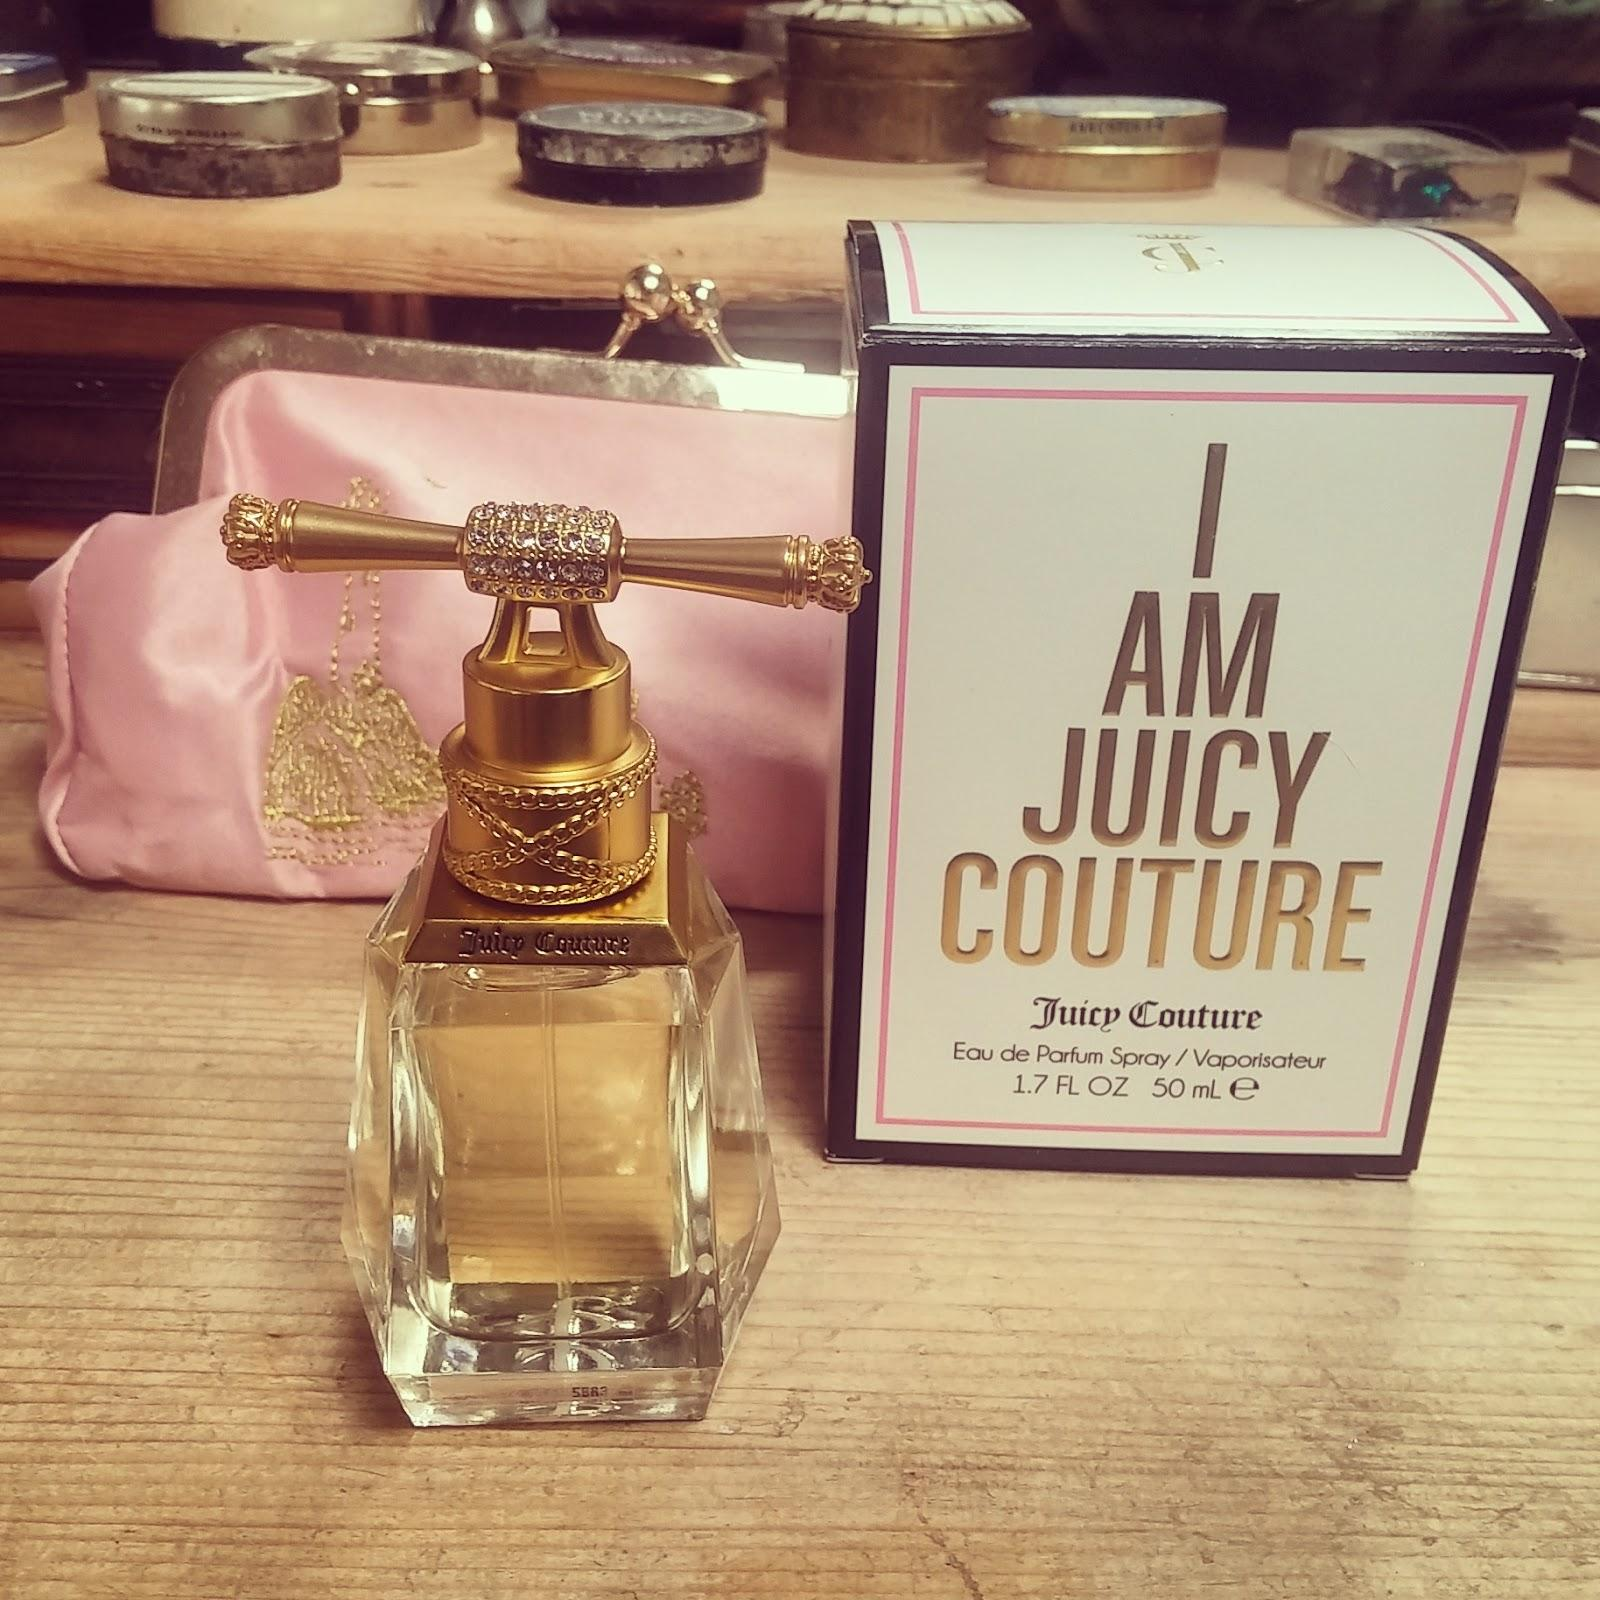 I AM JUICY COUTURE tuoksu joka hurmaa naisellisella itsevarmuudella niin naiset, kuin miehetkin!